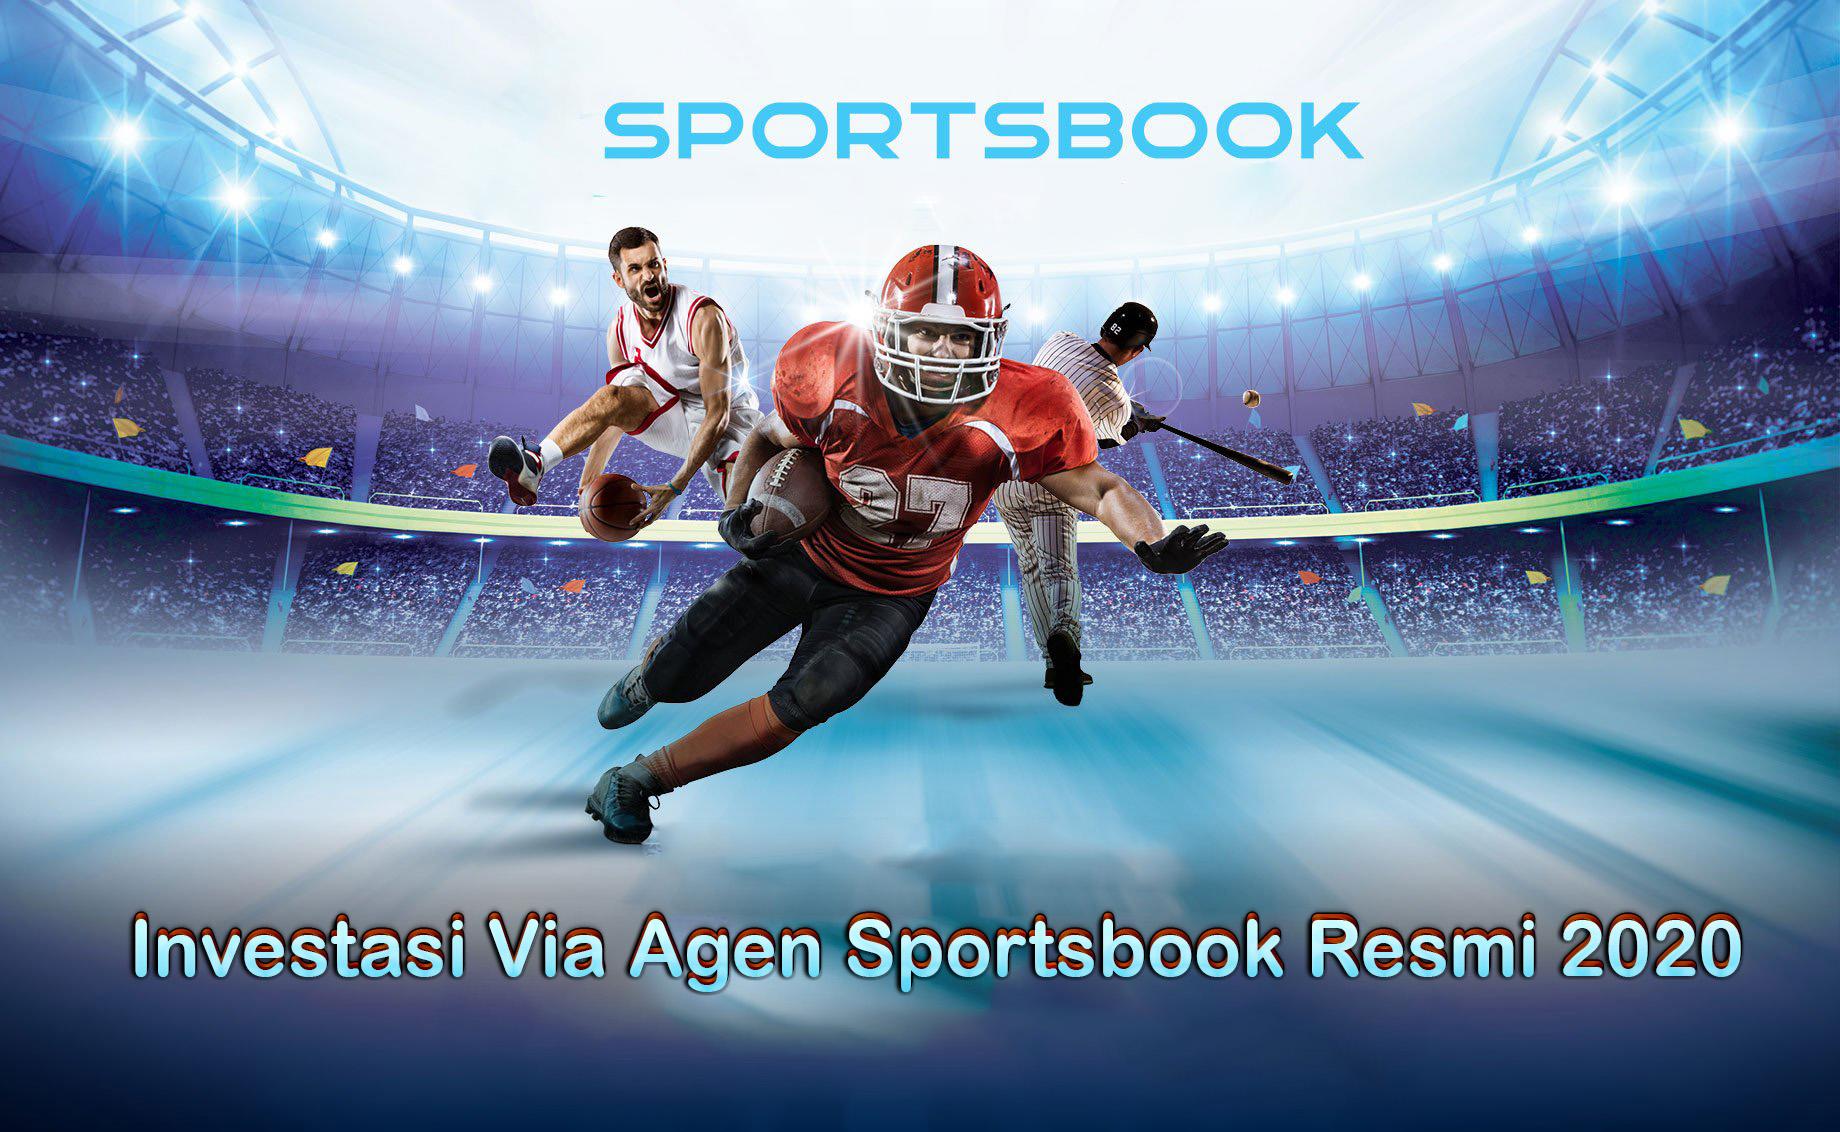 Investasi Via Agen Sportsbook